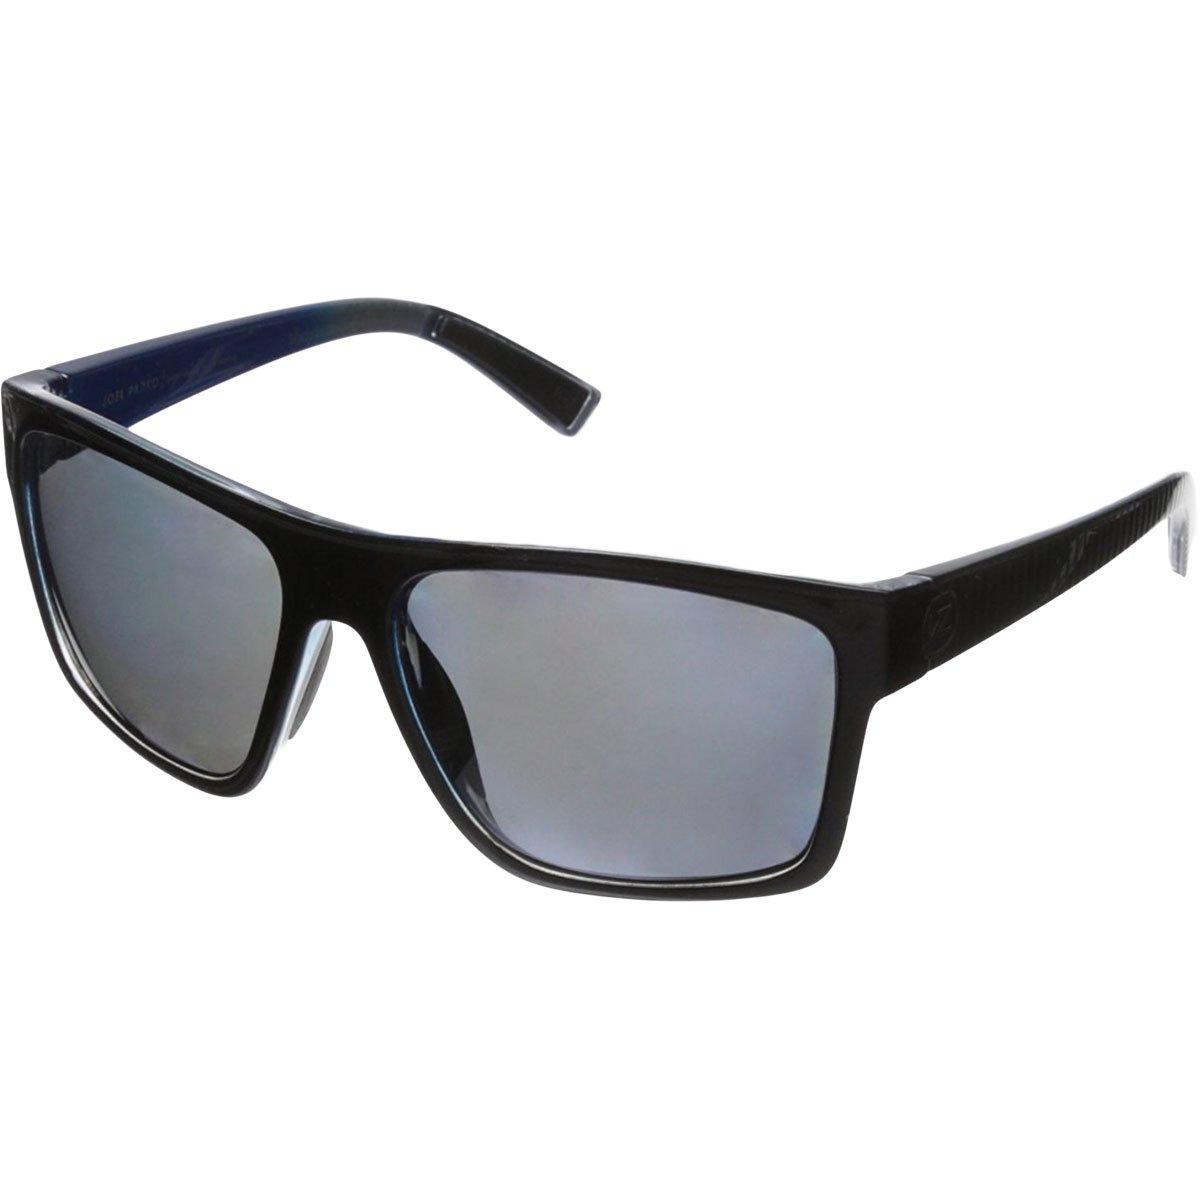 VonZipper Dipstick Polar Polarized Rectangular Sunglasses, Parko Black Stripe/Silver Polar, 60 mm